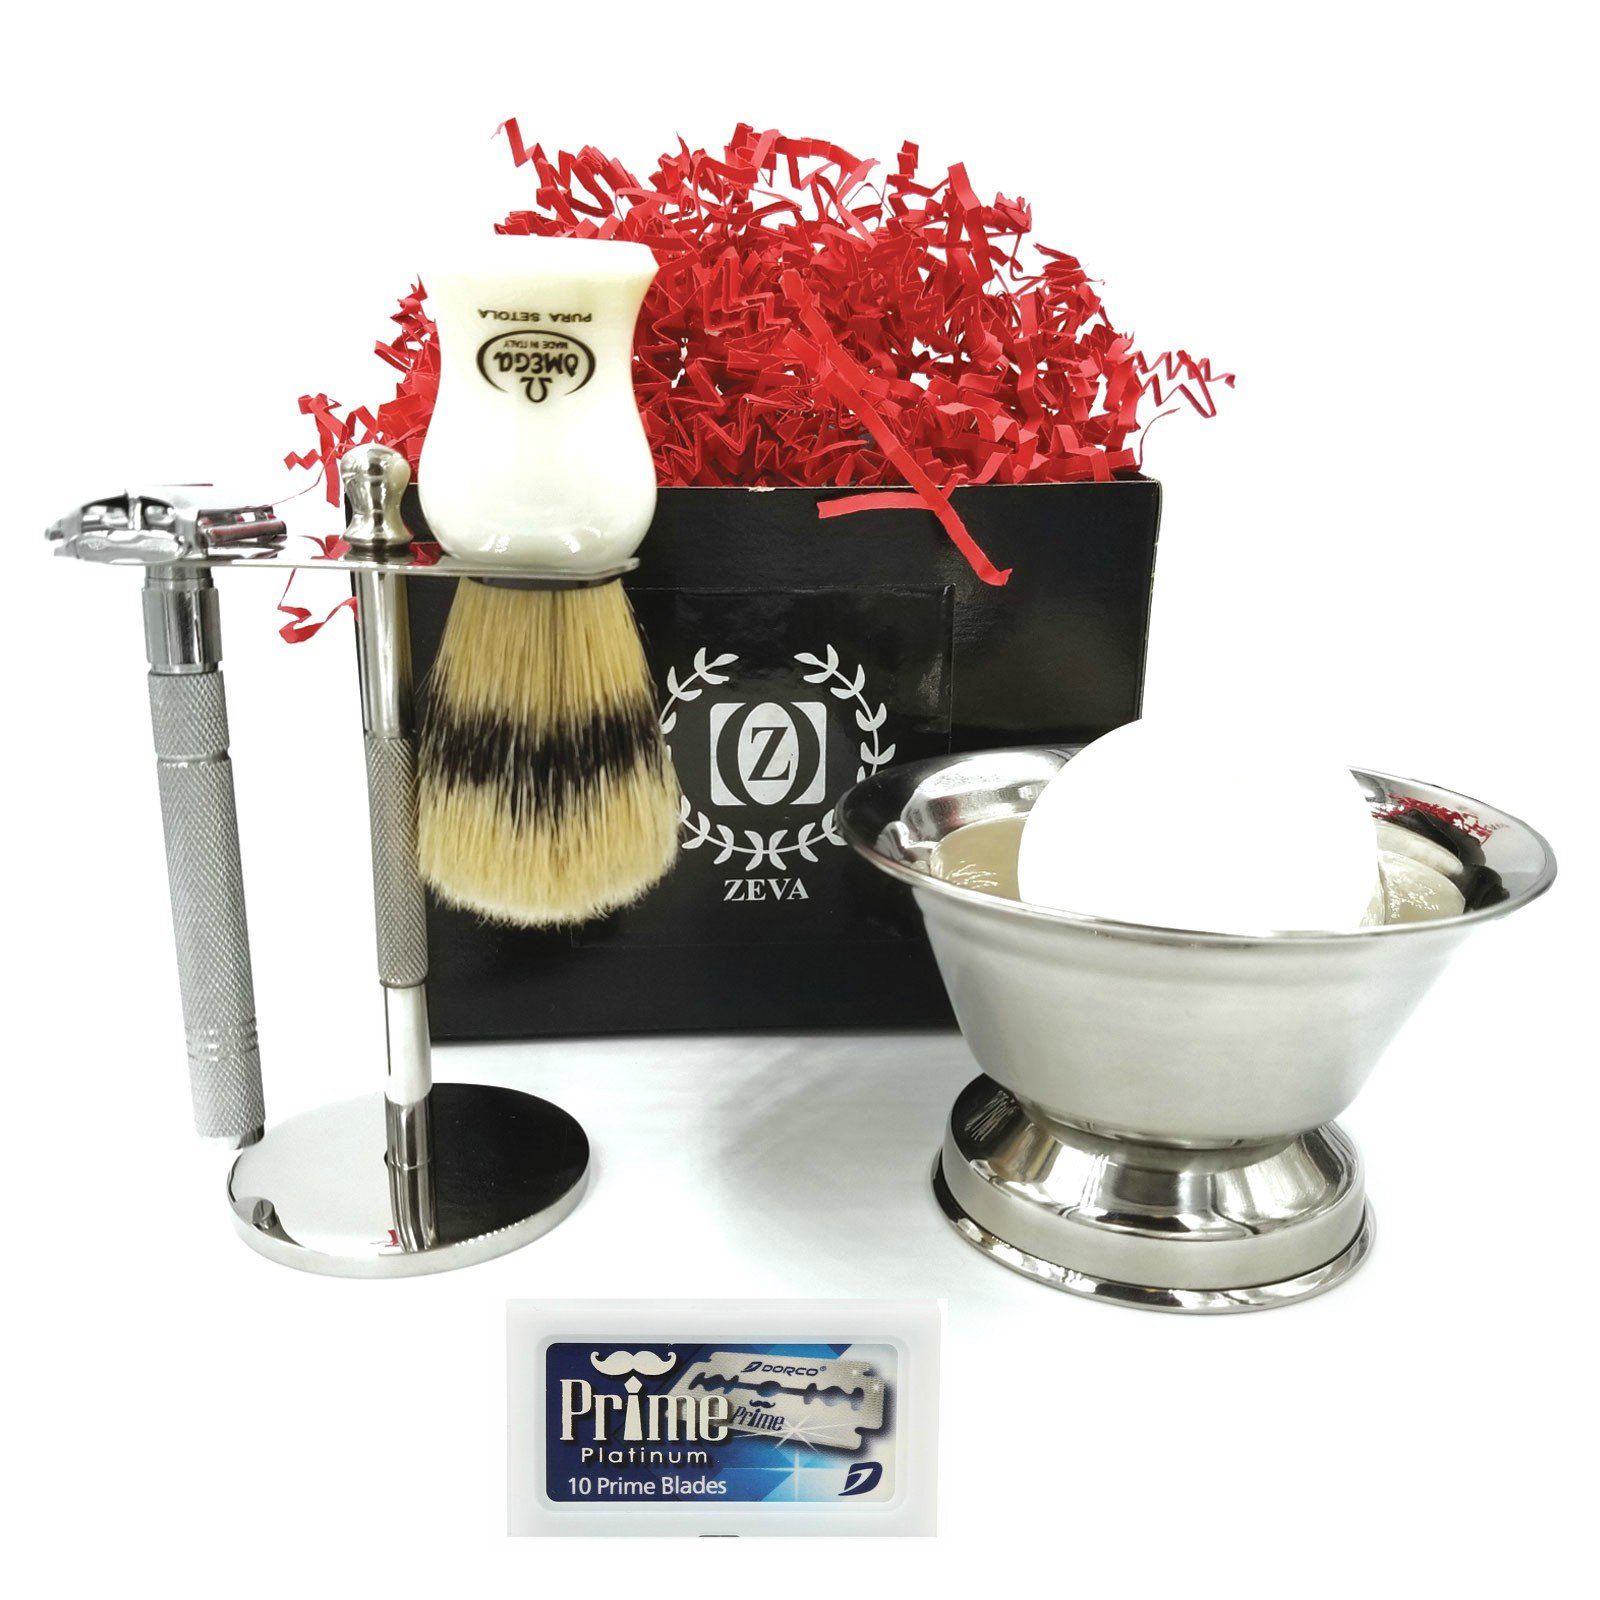 Men's Shaving Set 5 Pieces Double Edge Safety Razor Set Kit Omega Pure Bristle Shaving Brush Stand Shaving Cup & Shaving Soap Gift Set/Kit